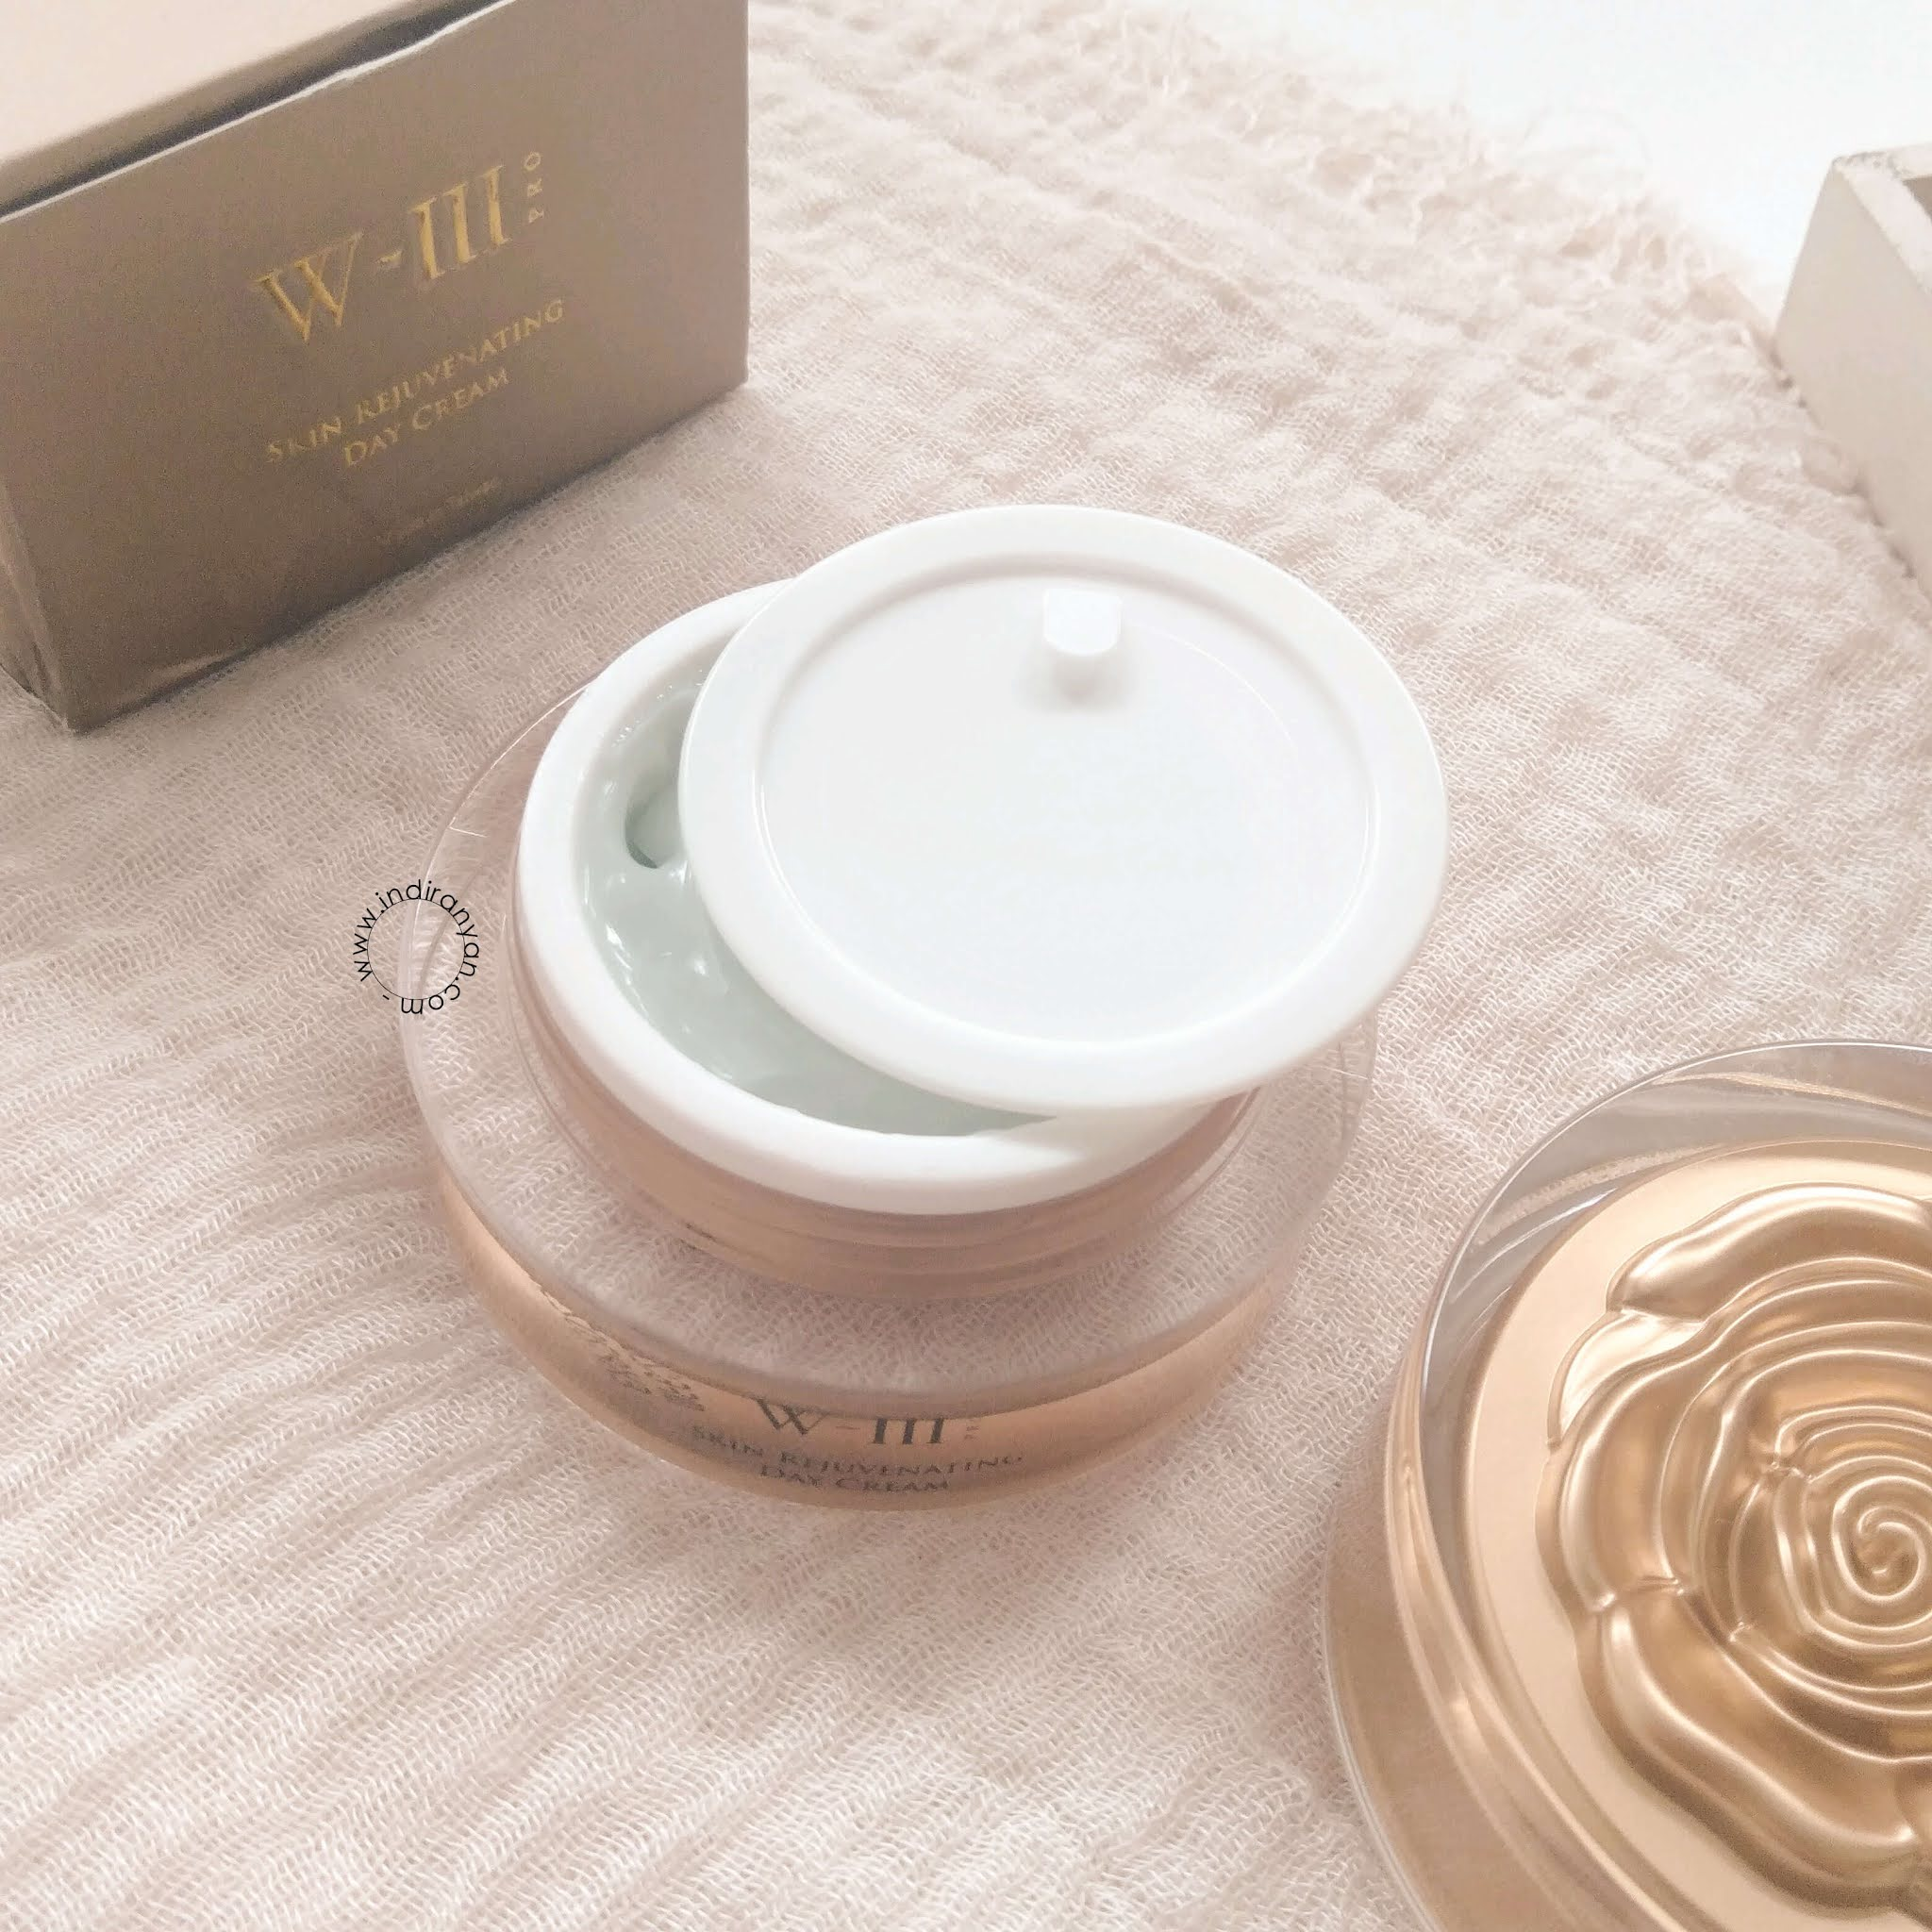 WIII-skincare-day-cream